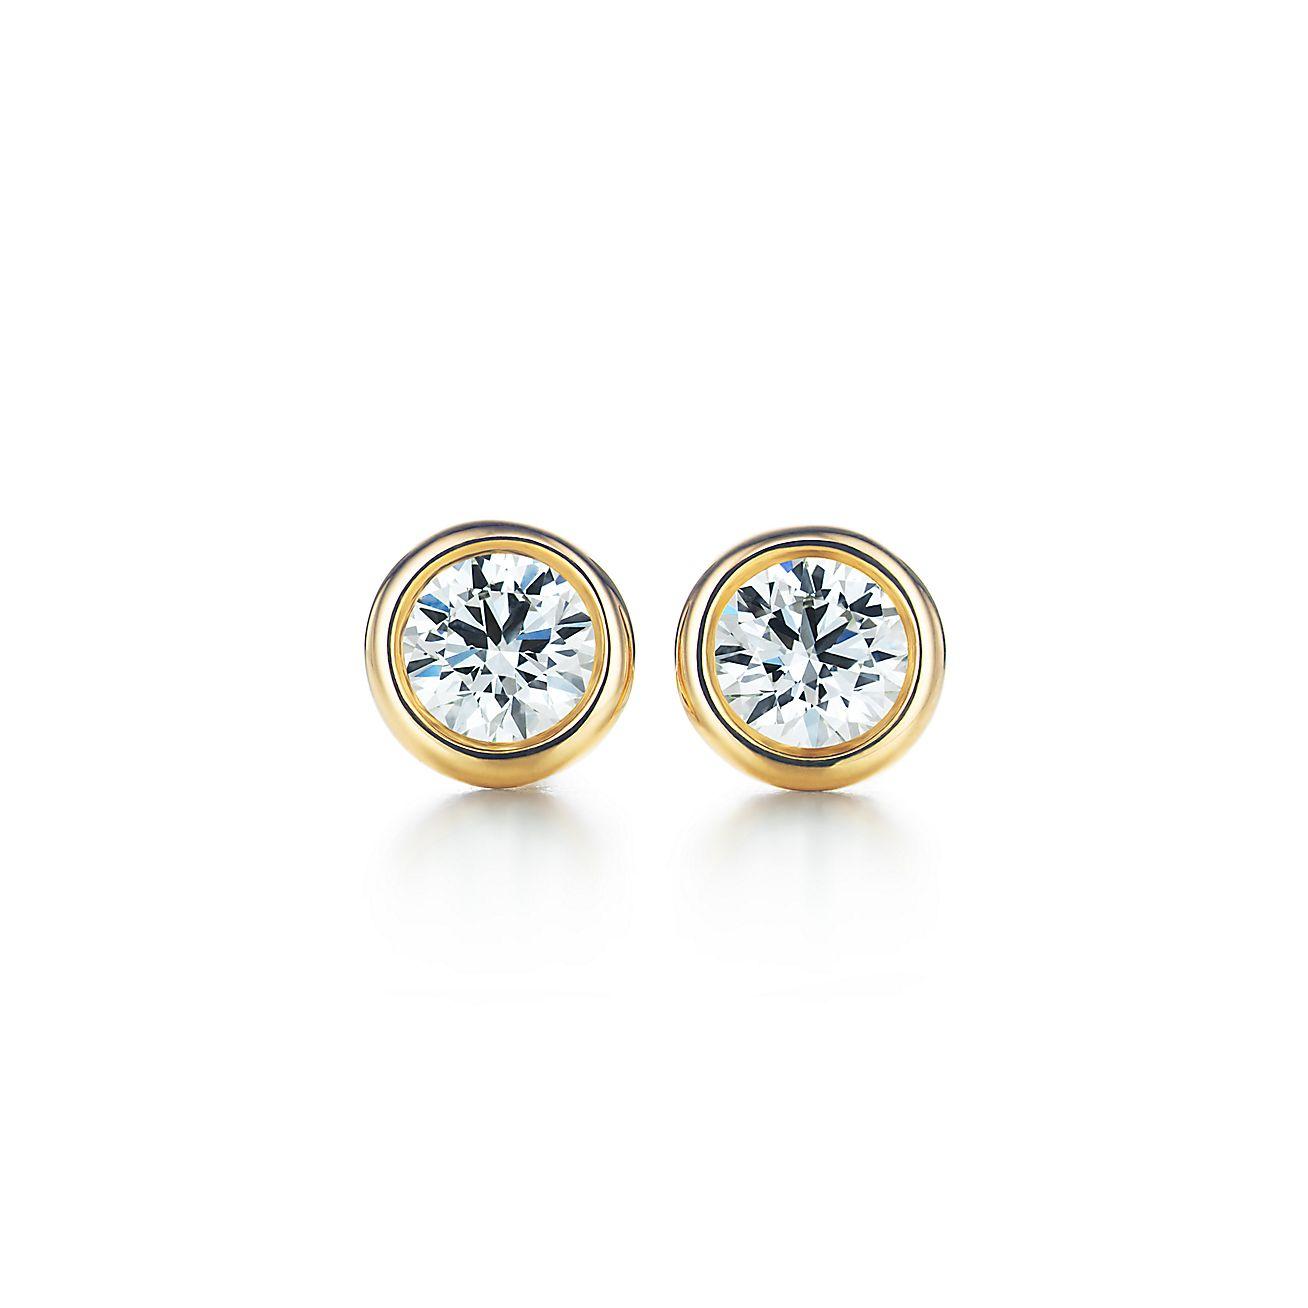 Elsa Peretti Diamonds By The Yard Earrings In Yellow Gold Tiffany Co